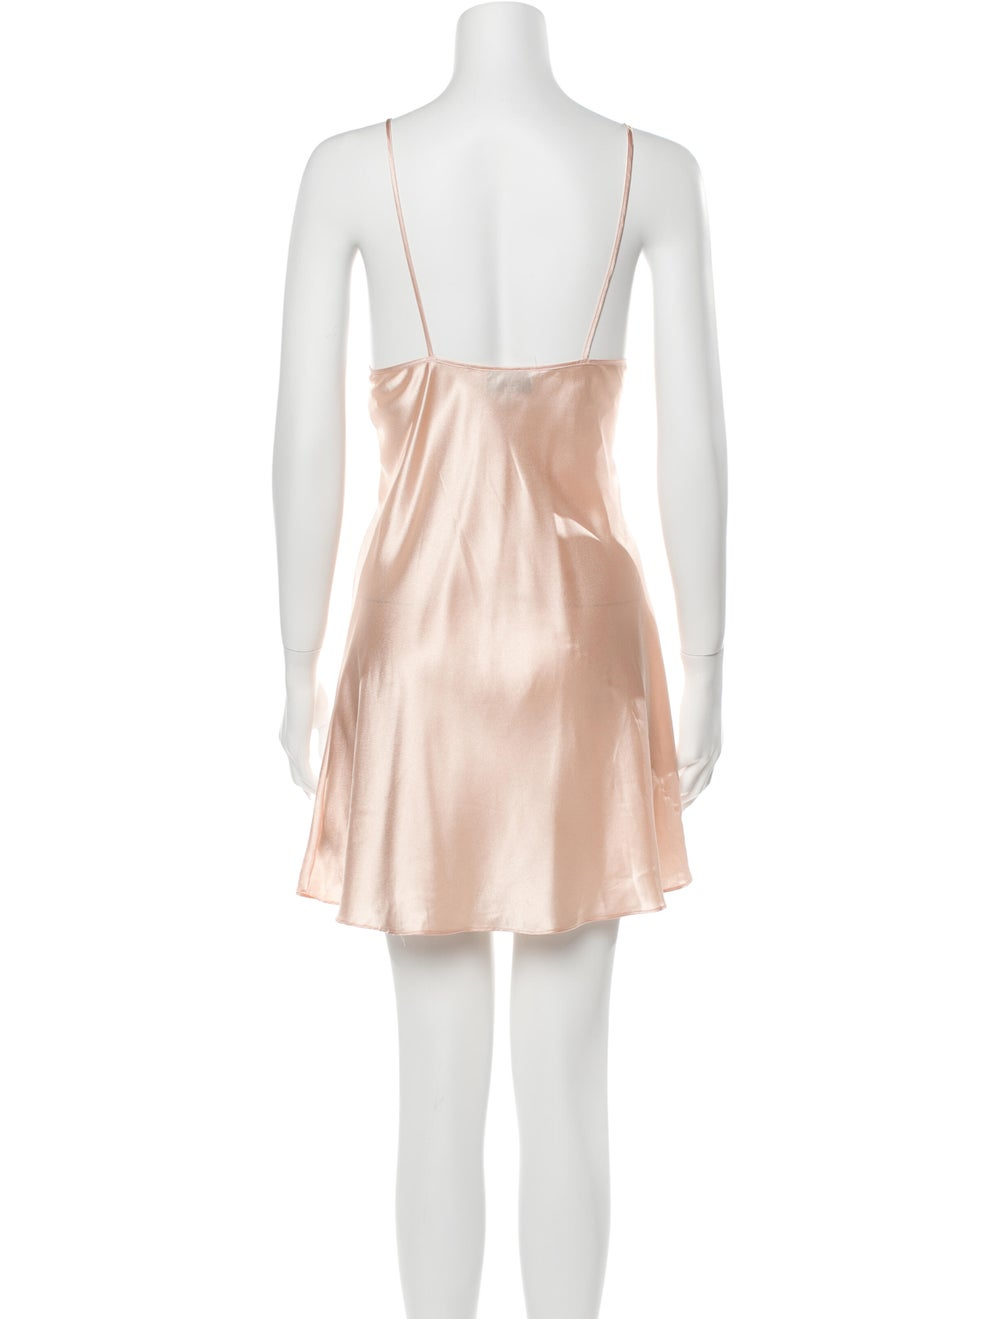 Valentino Vintage Satin Nightgown Pink - image 3